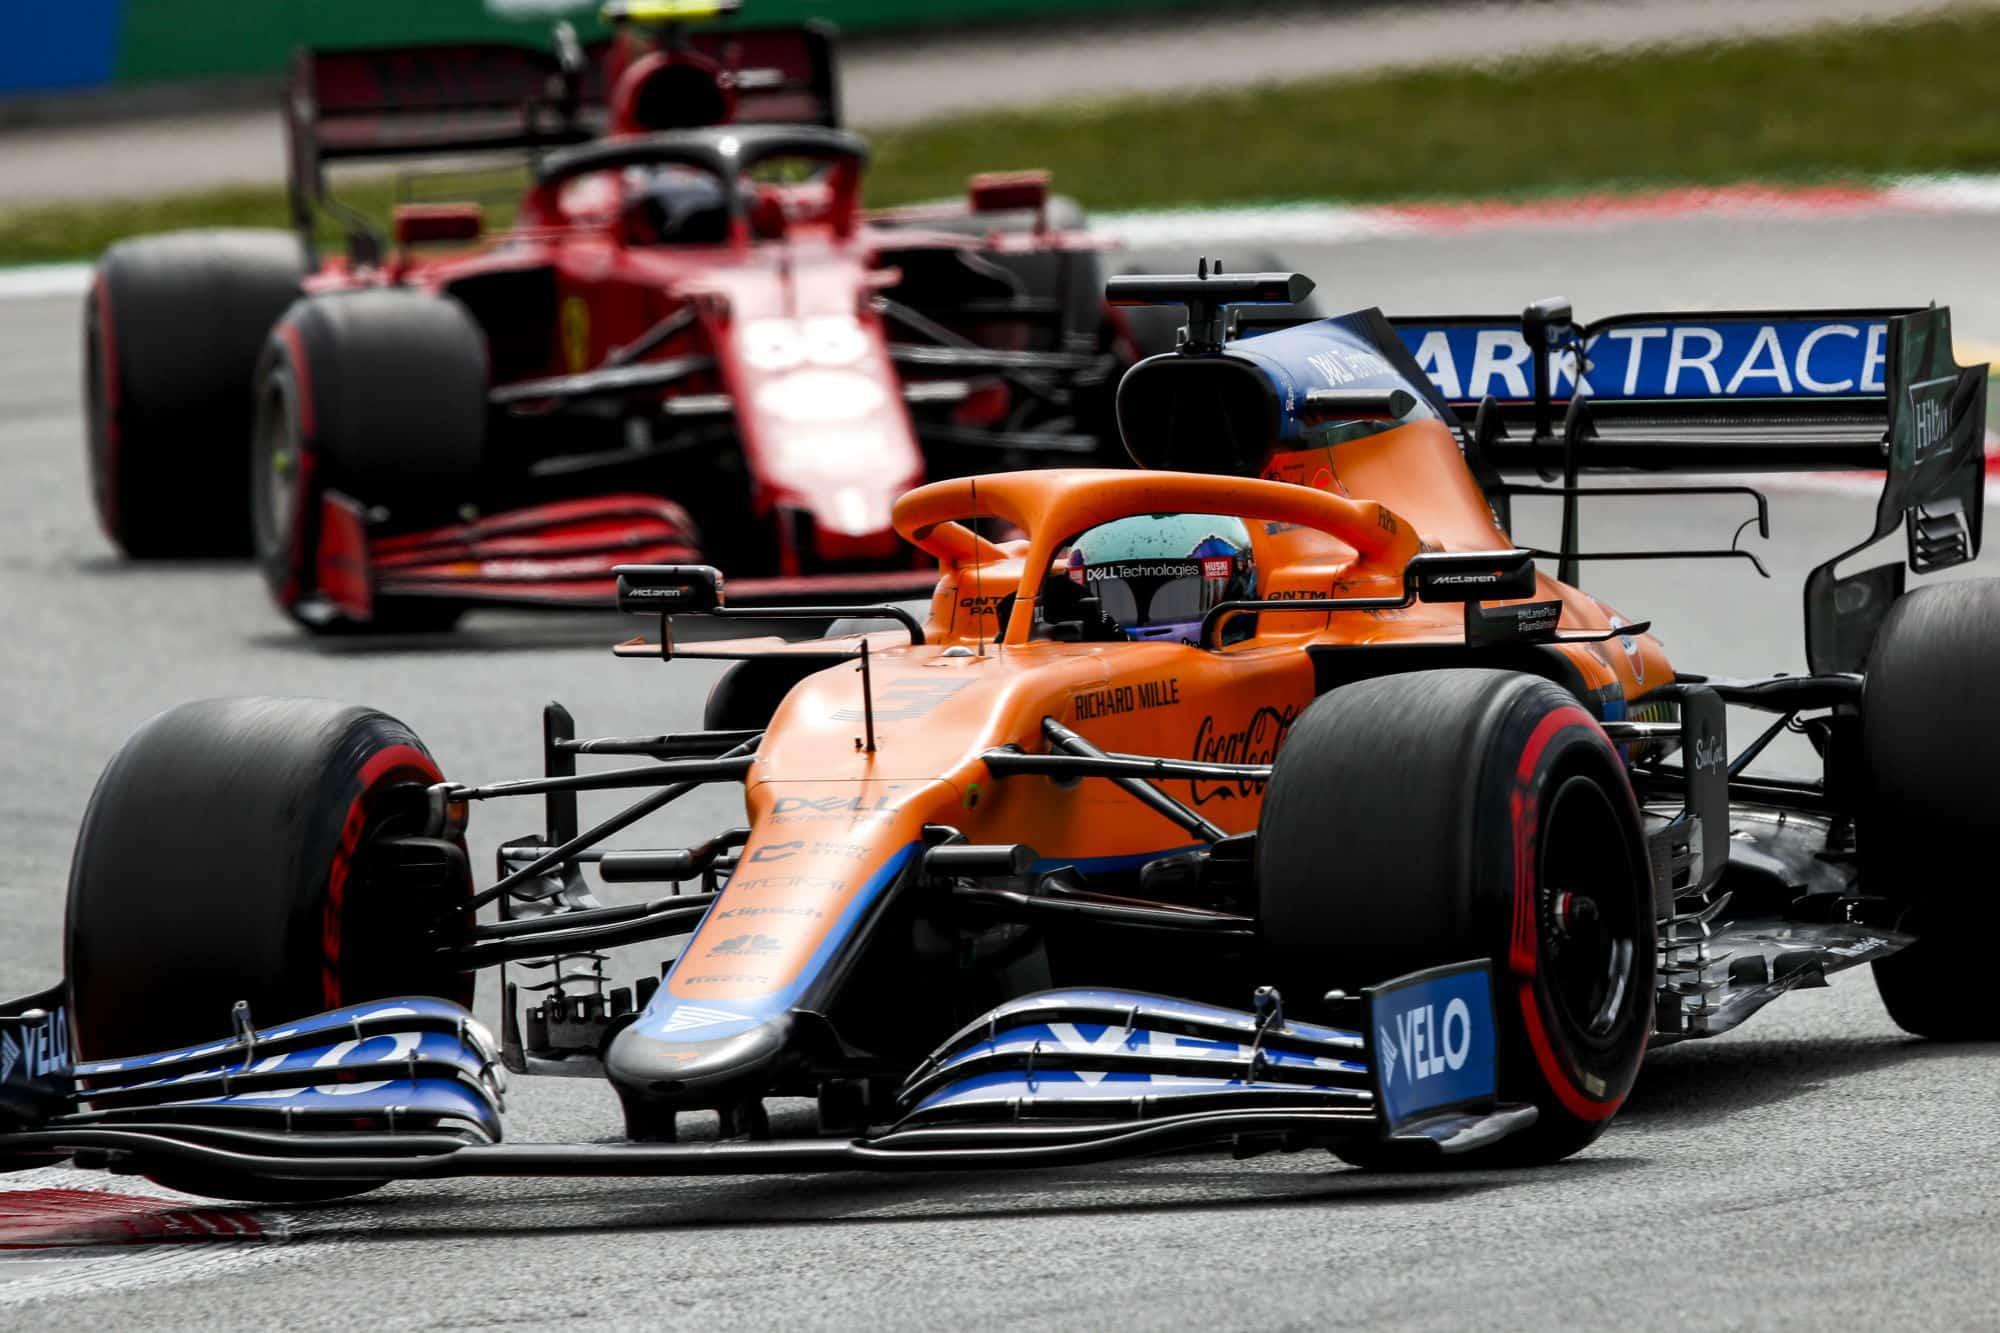 2021 Spanish GP Ricciardo leads Sainz Photo McLaren